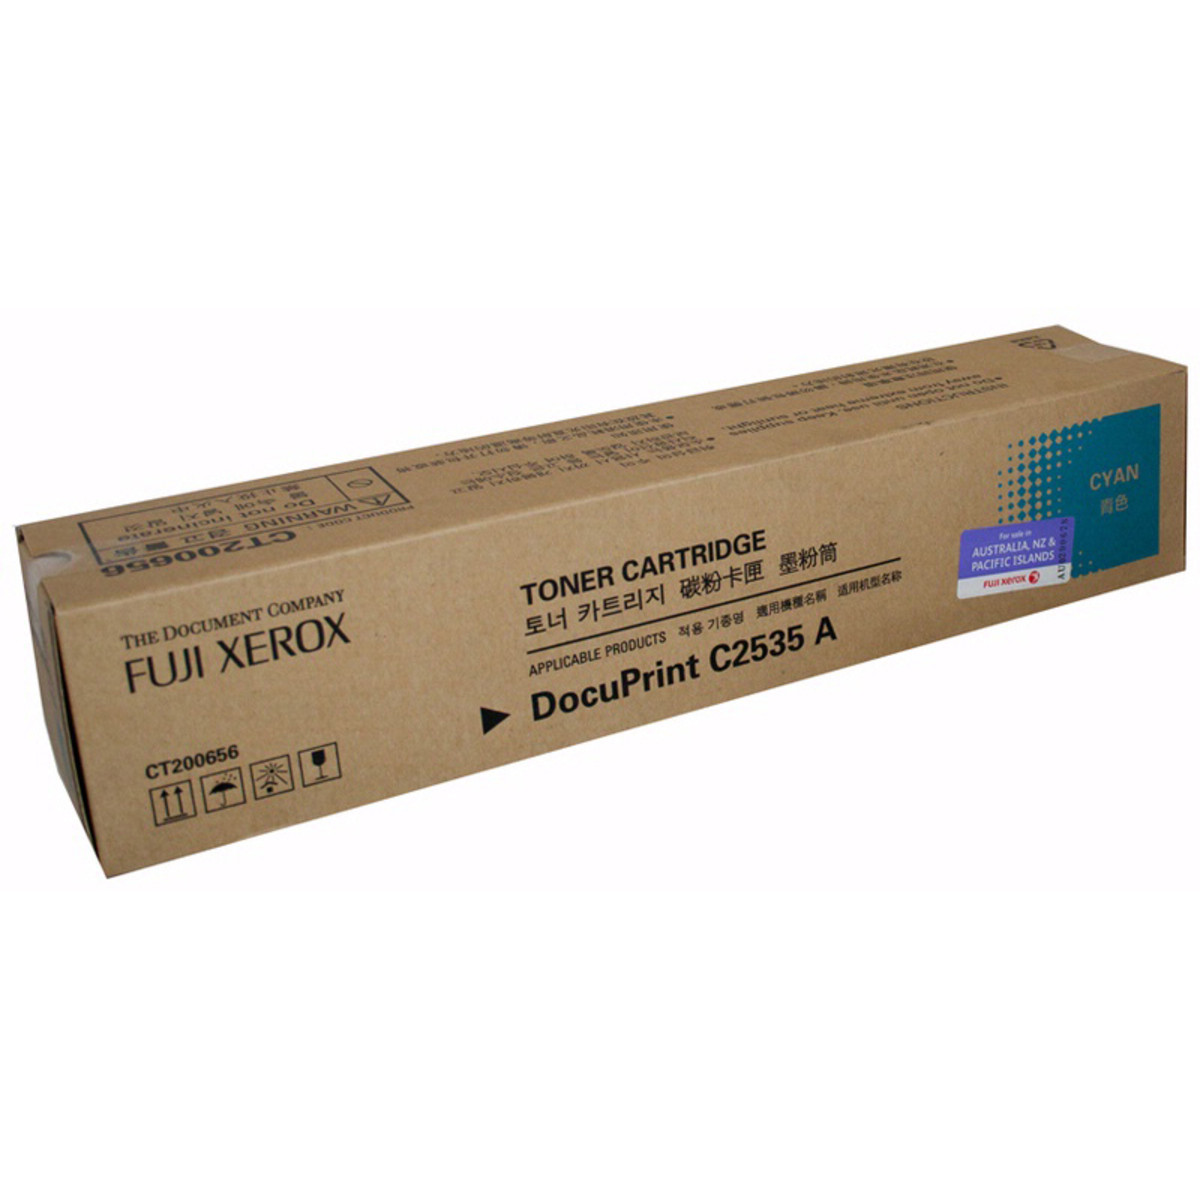 Xerox CT200656 Cyan Toner Cartridge